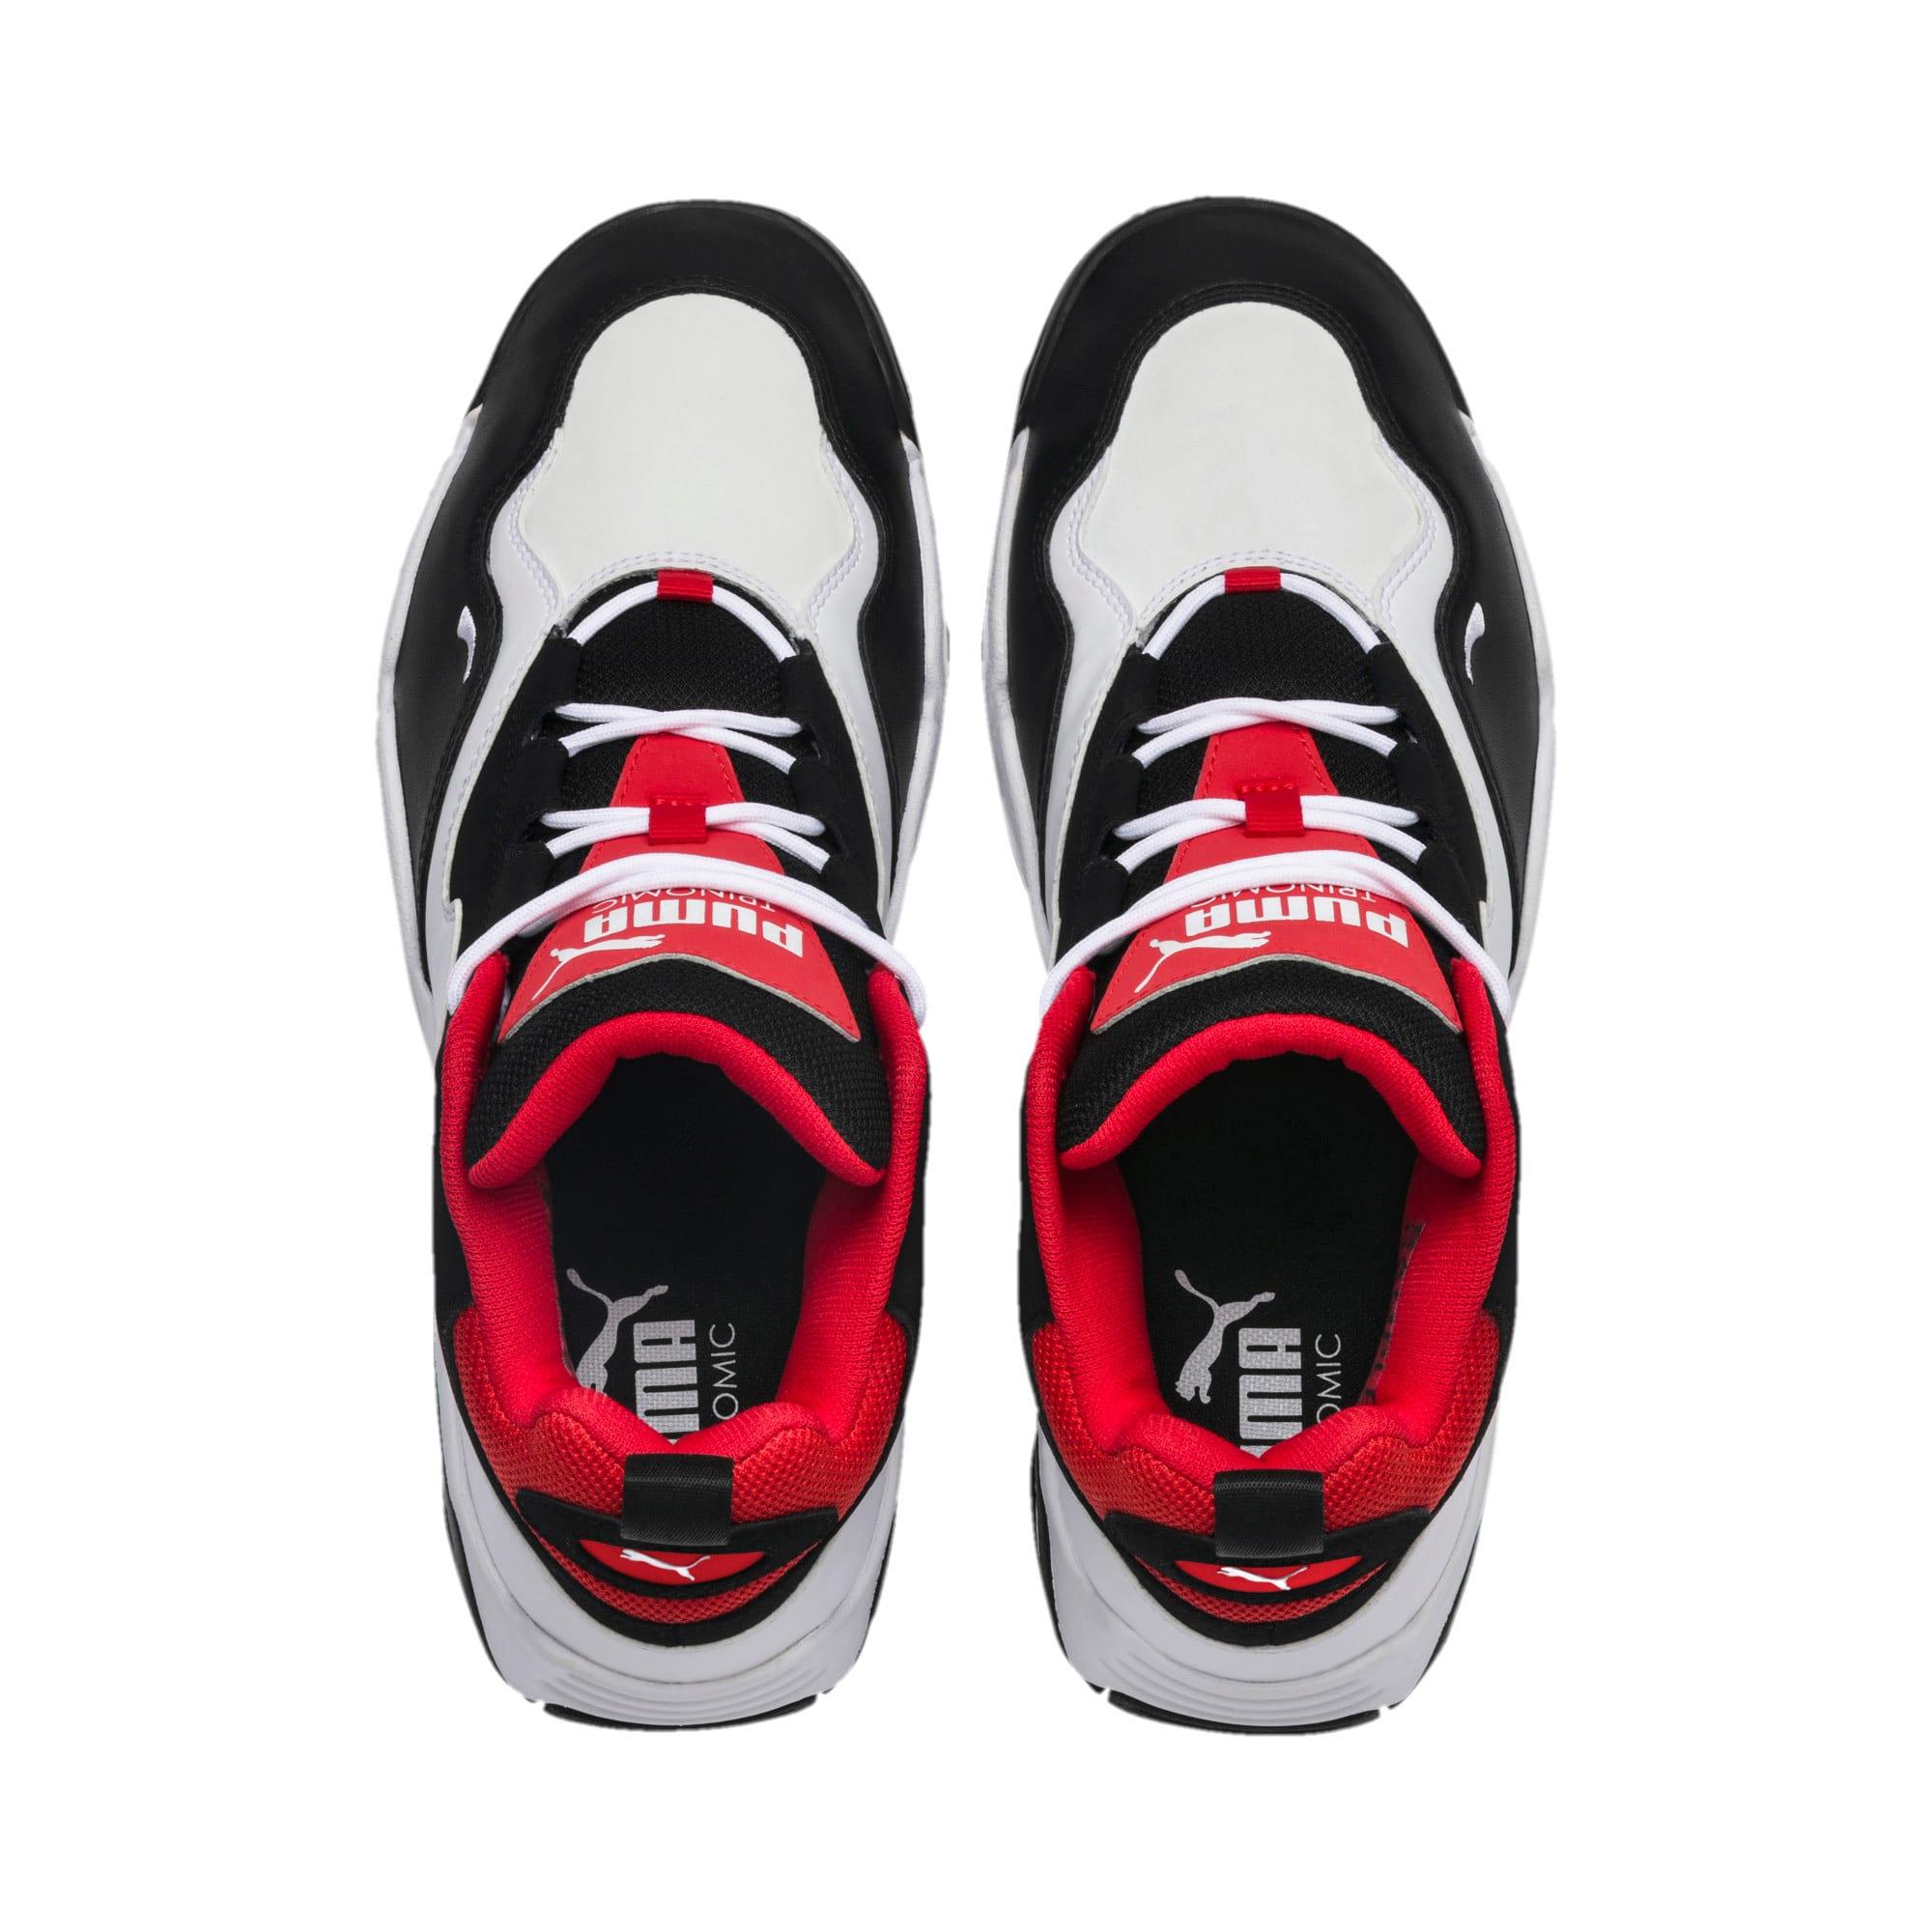 Miniatura 6 de Zapatos deportivos Source de caña media, Black- White-High Risk Red, mediano